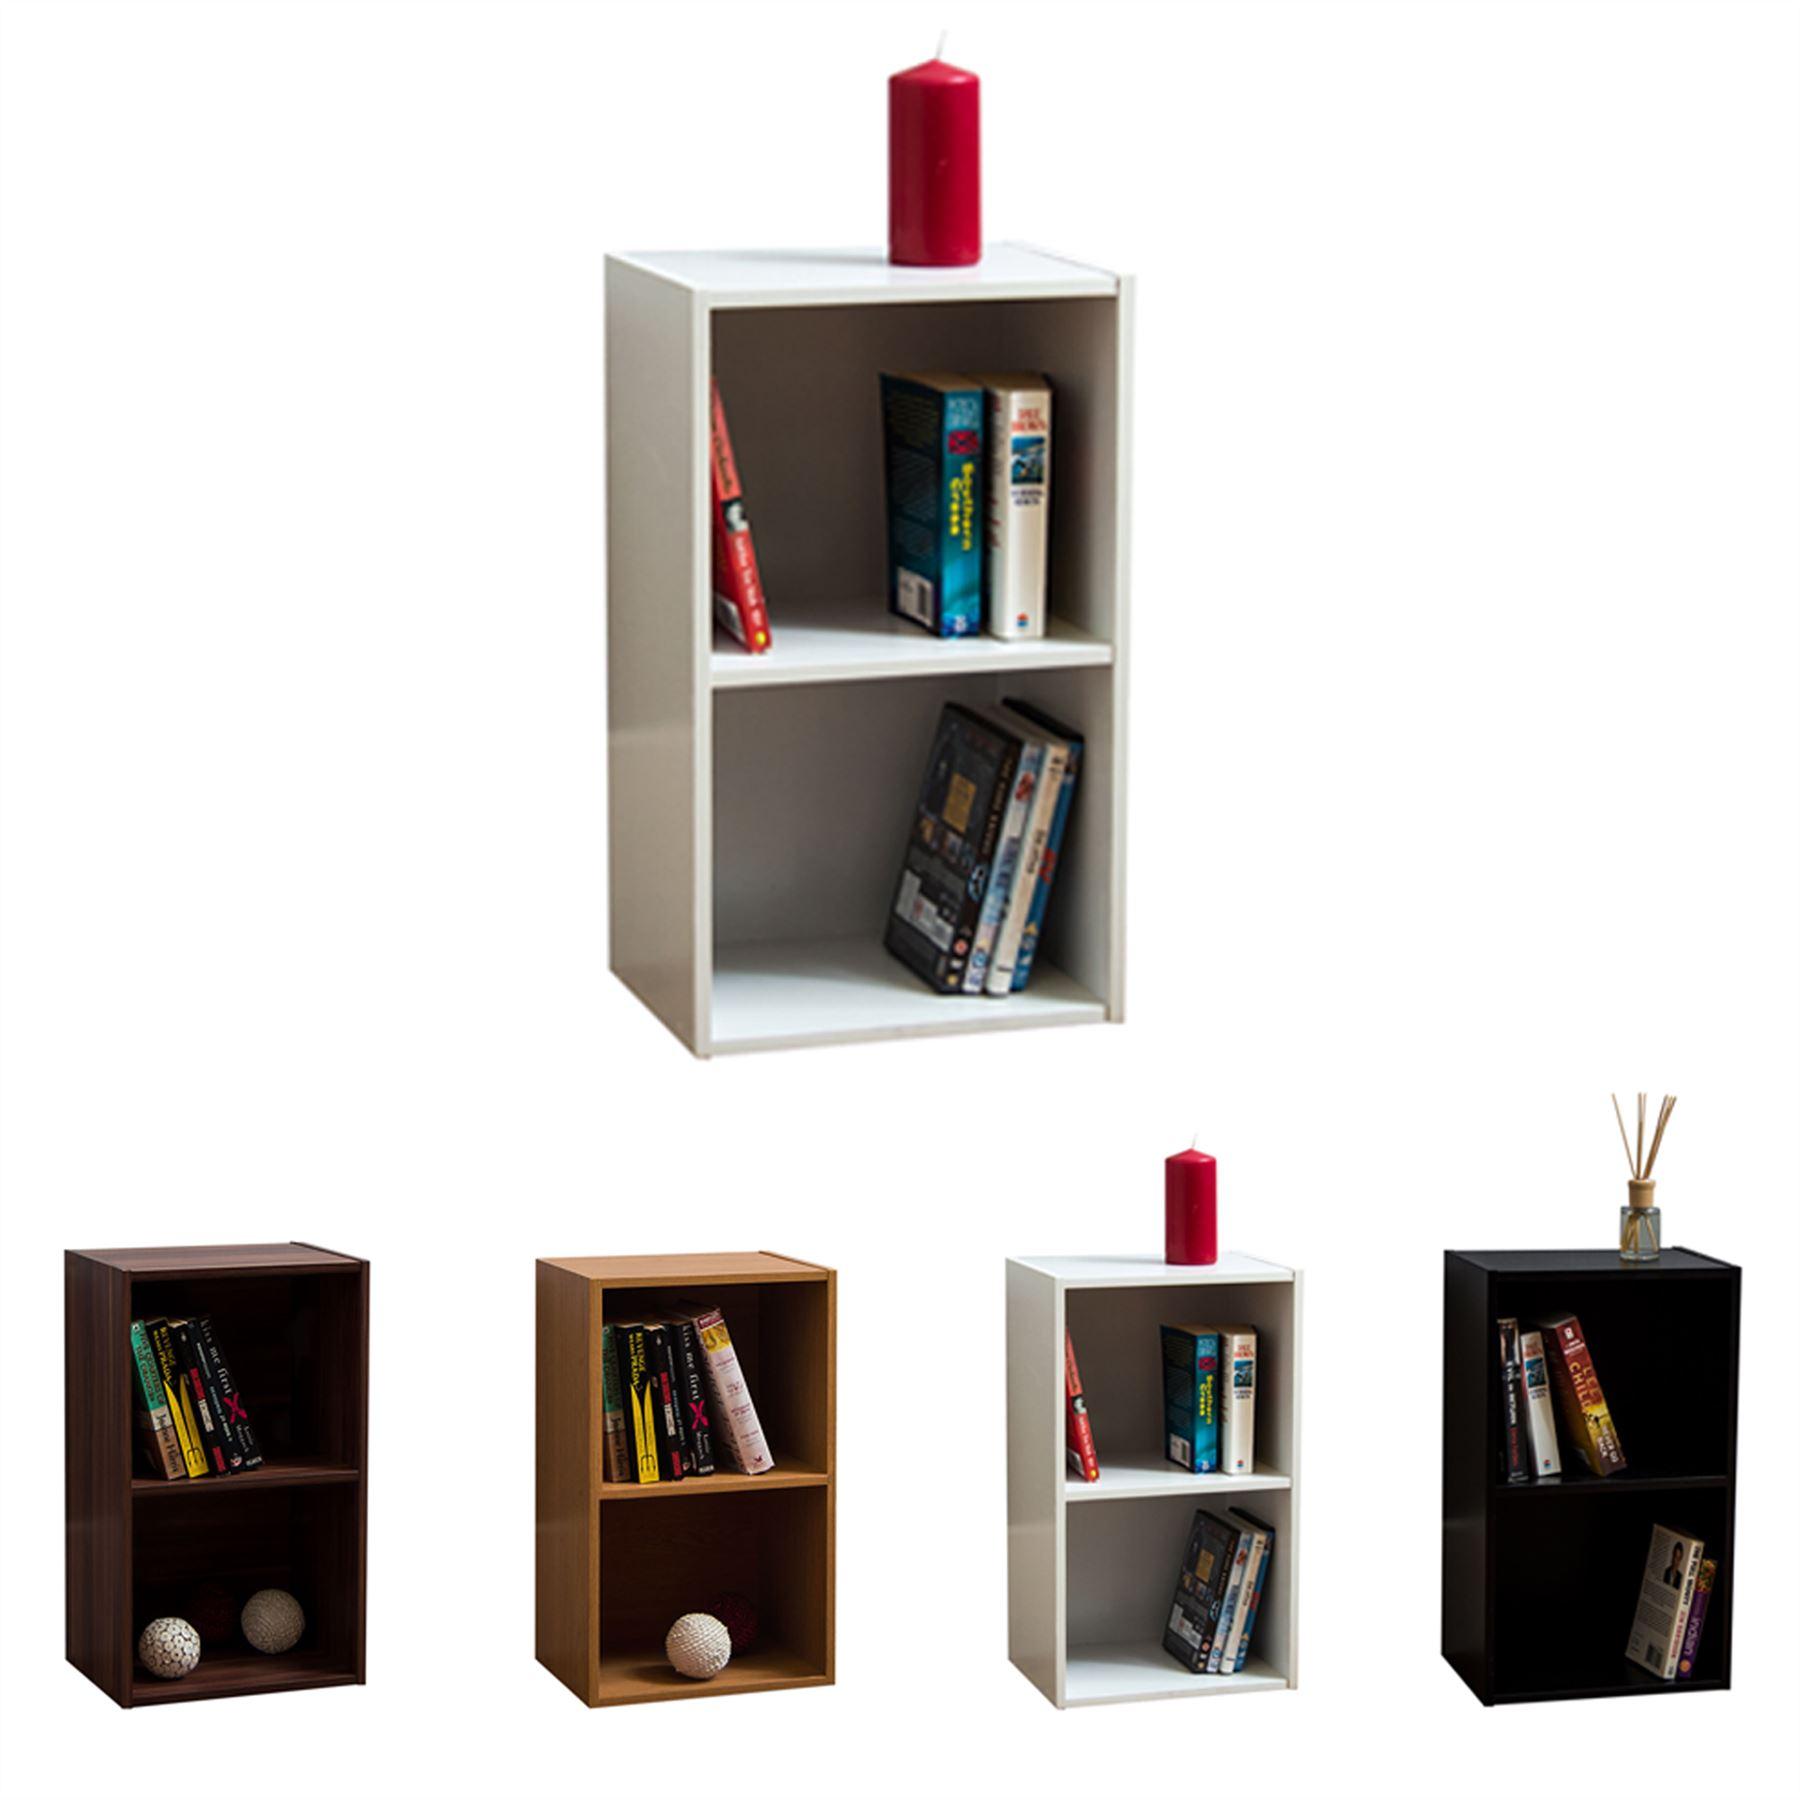 Cambridge 3 Tier Low Bookcase Display Shelving Storage Unit Wood Stand Walnut